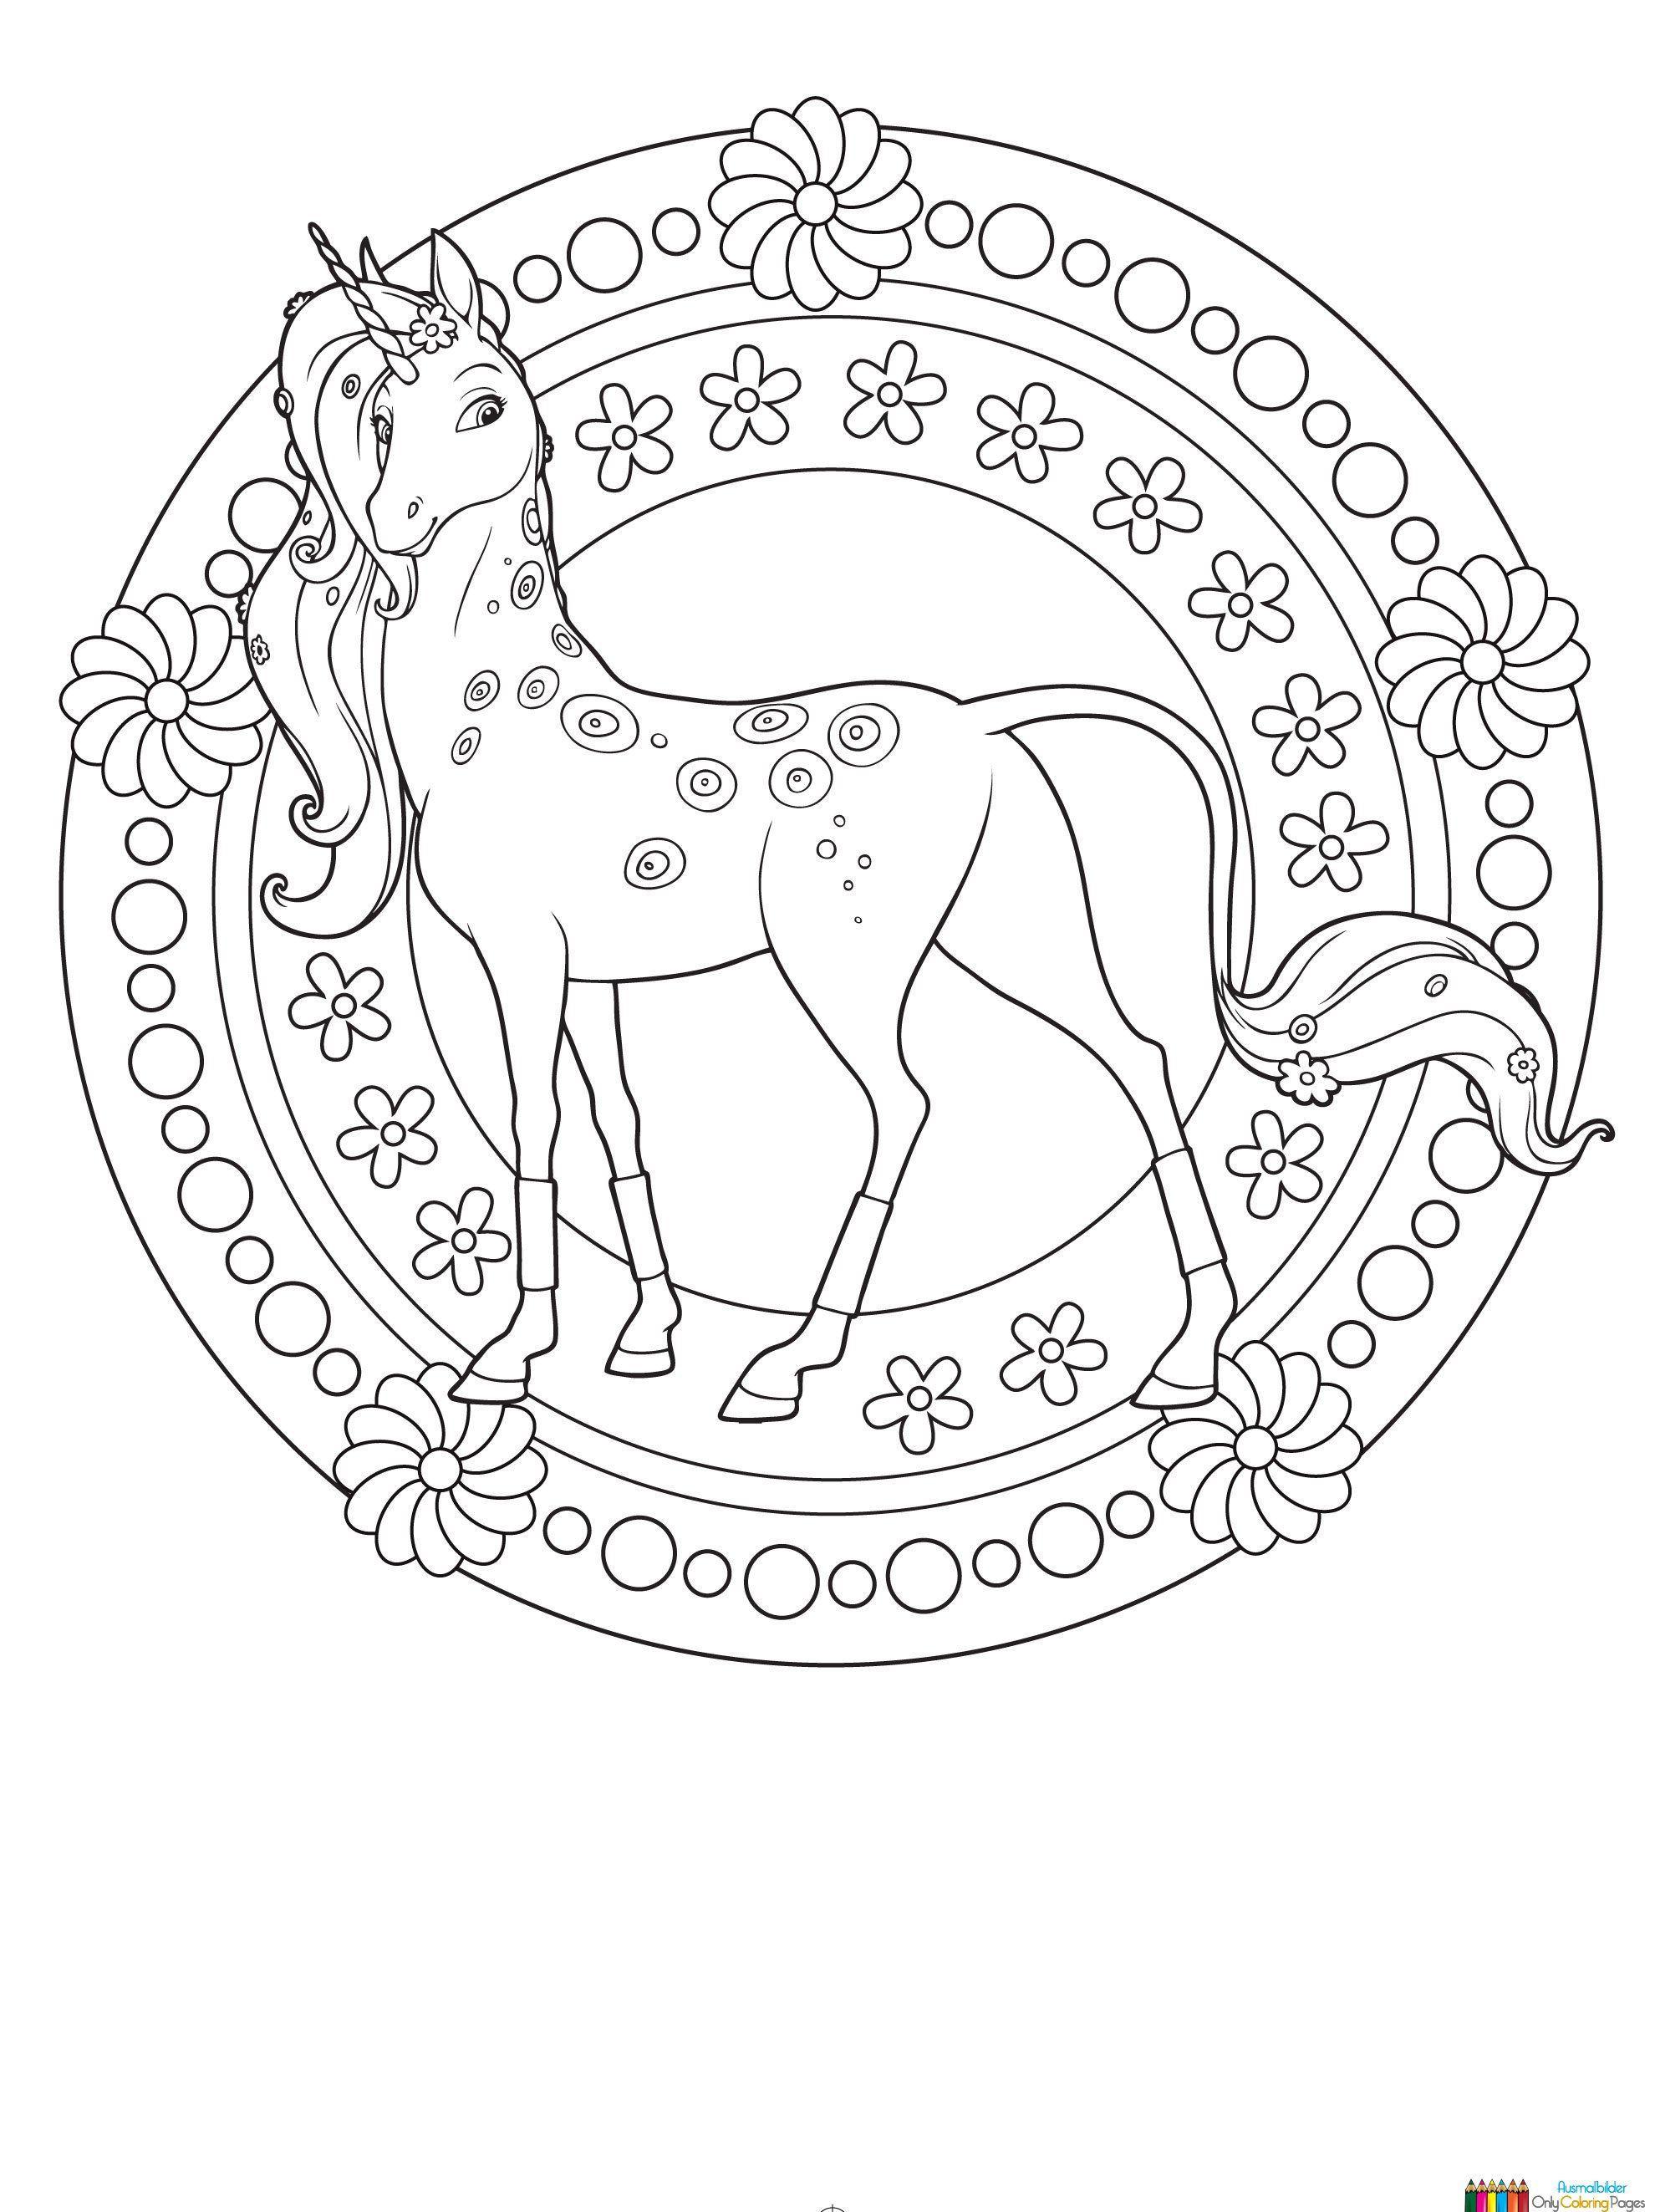 Equestria Girls Ausmalbilder Neu Alice Im Wunderland Ausmalbilder Frisch 40 Ausmalbilder Equestria Galerie